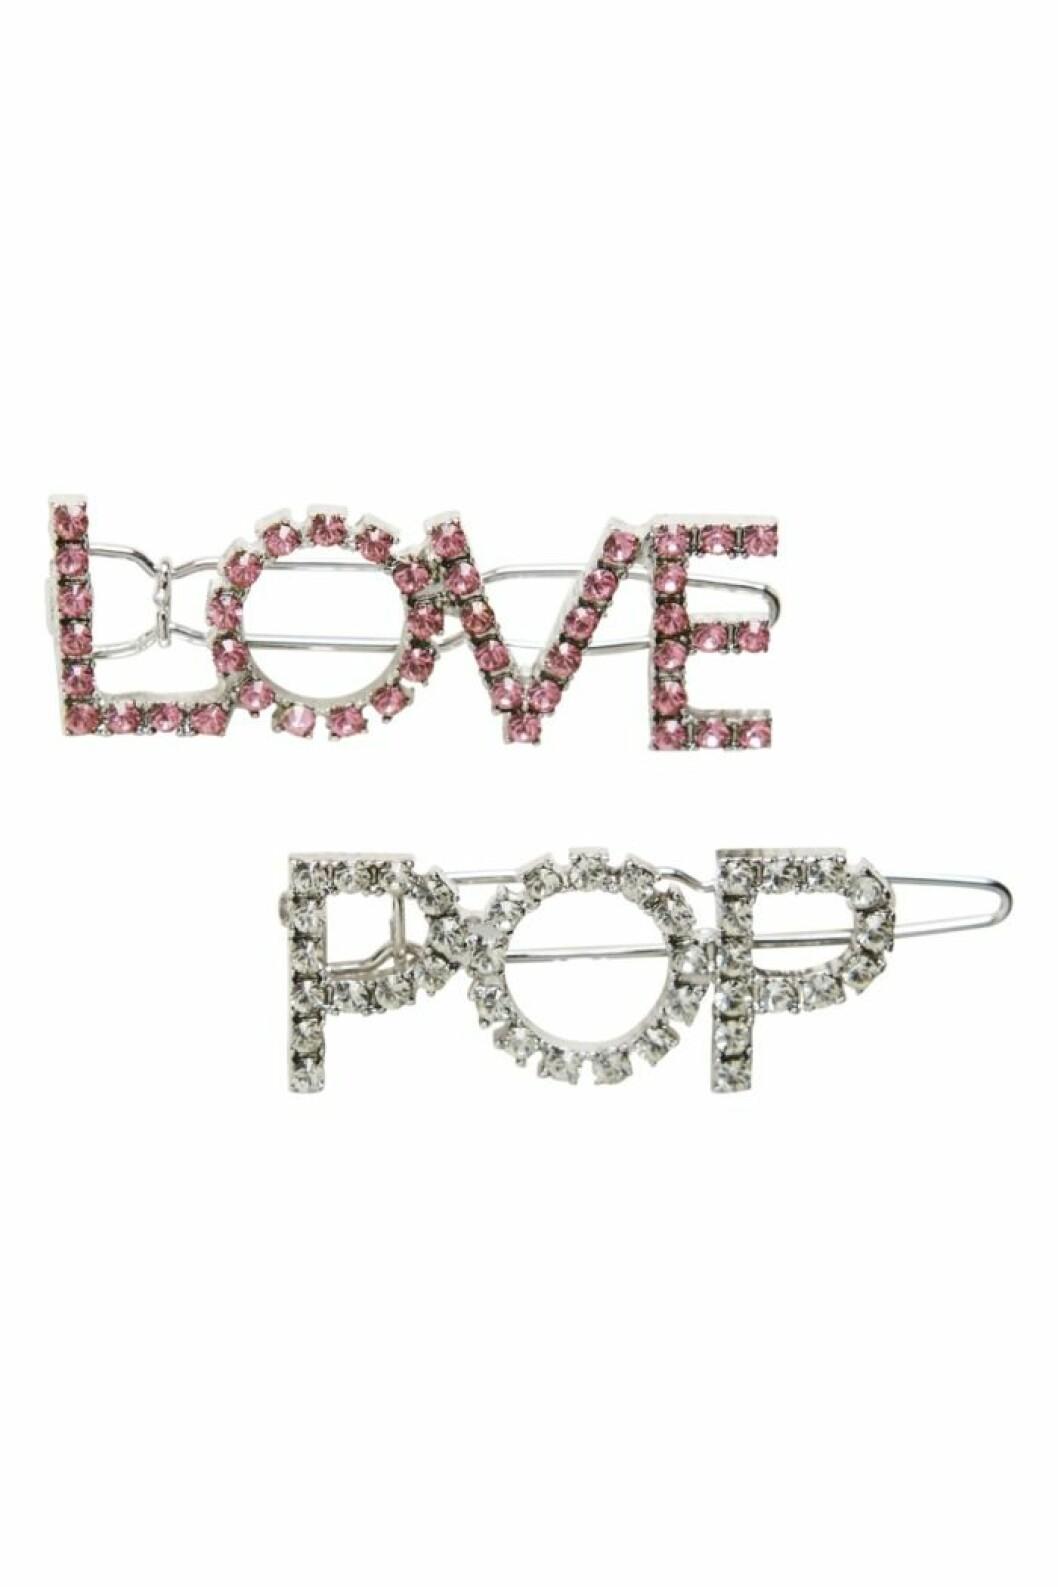 Icona Pop x Gina tricot kollektion